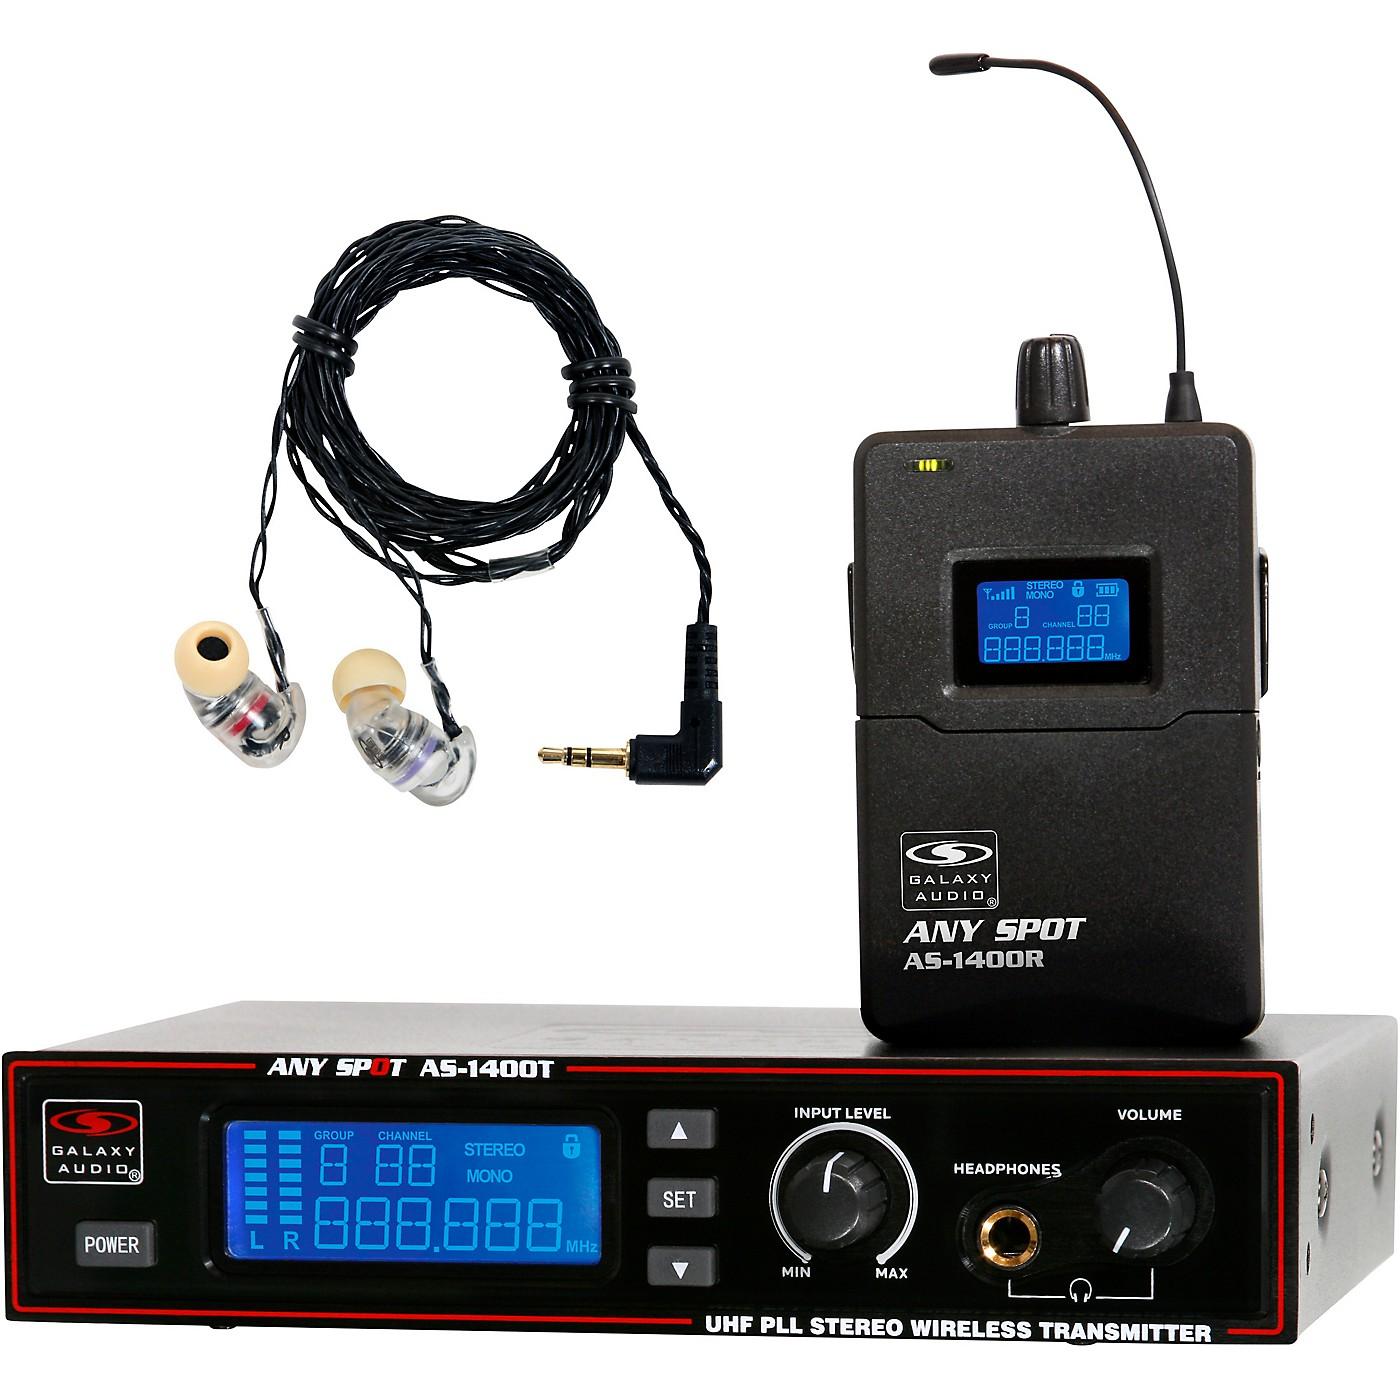 Galaxy Audio AS-1406 Wireless Personal Monitor thumbnail